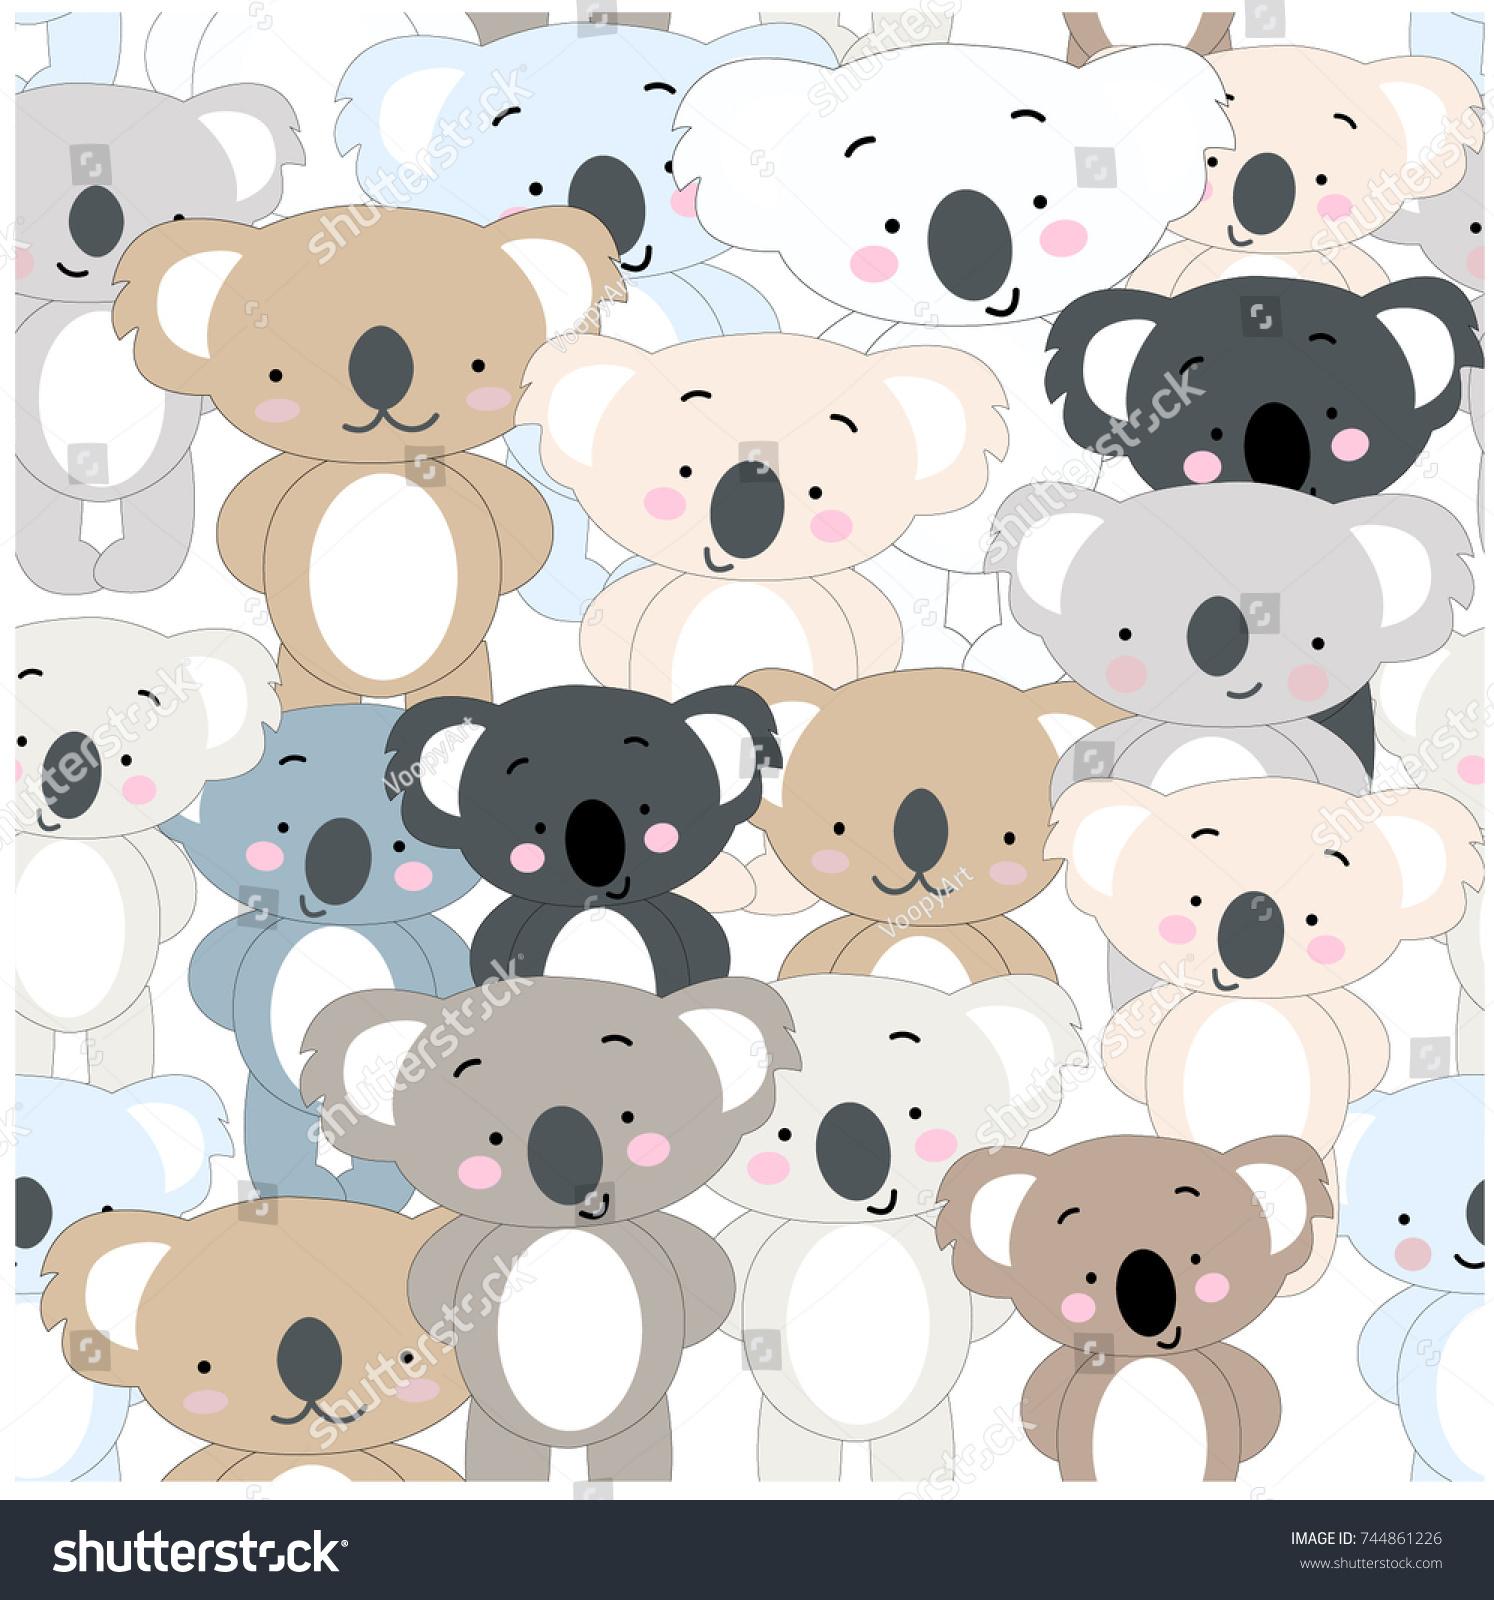 Download Wallpaper Koala Cartoon - stock-vector-vintage-seamless-cute-koala-bear-blue-grey-pastel-baby-teddy-cartoon-background-animal-set-pattern-744861226  Picture_431142   .jpg